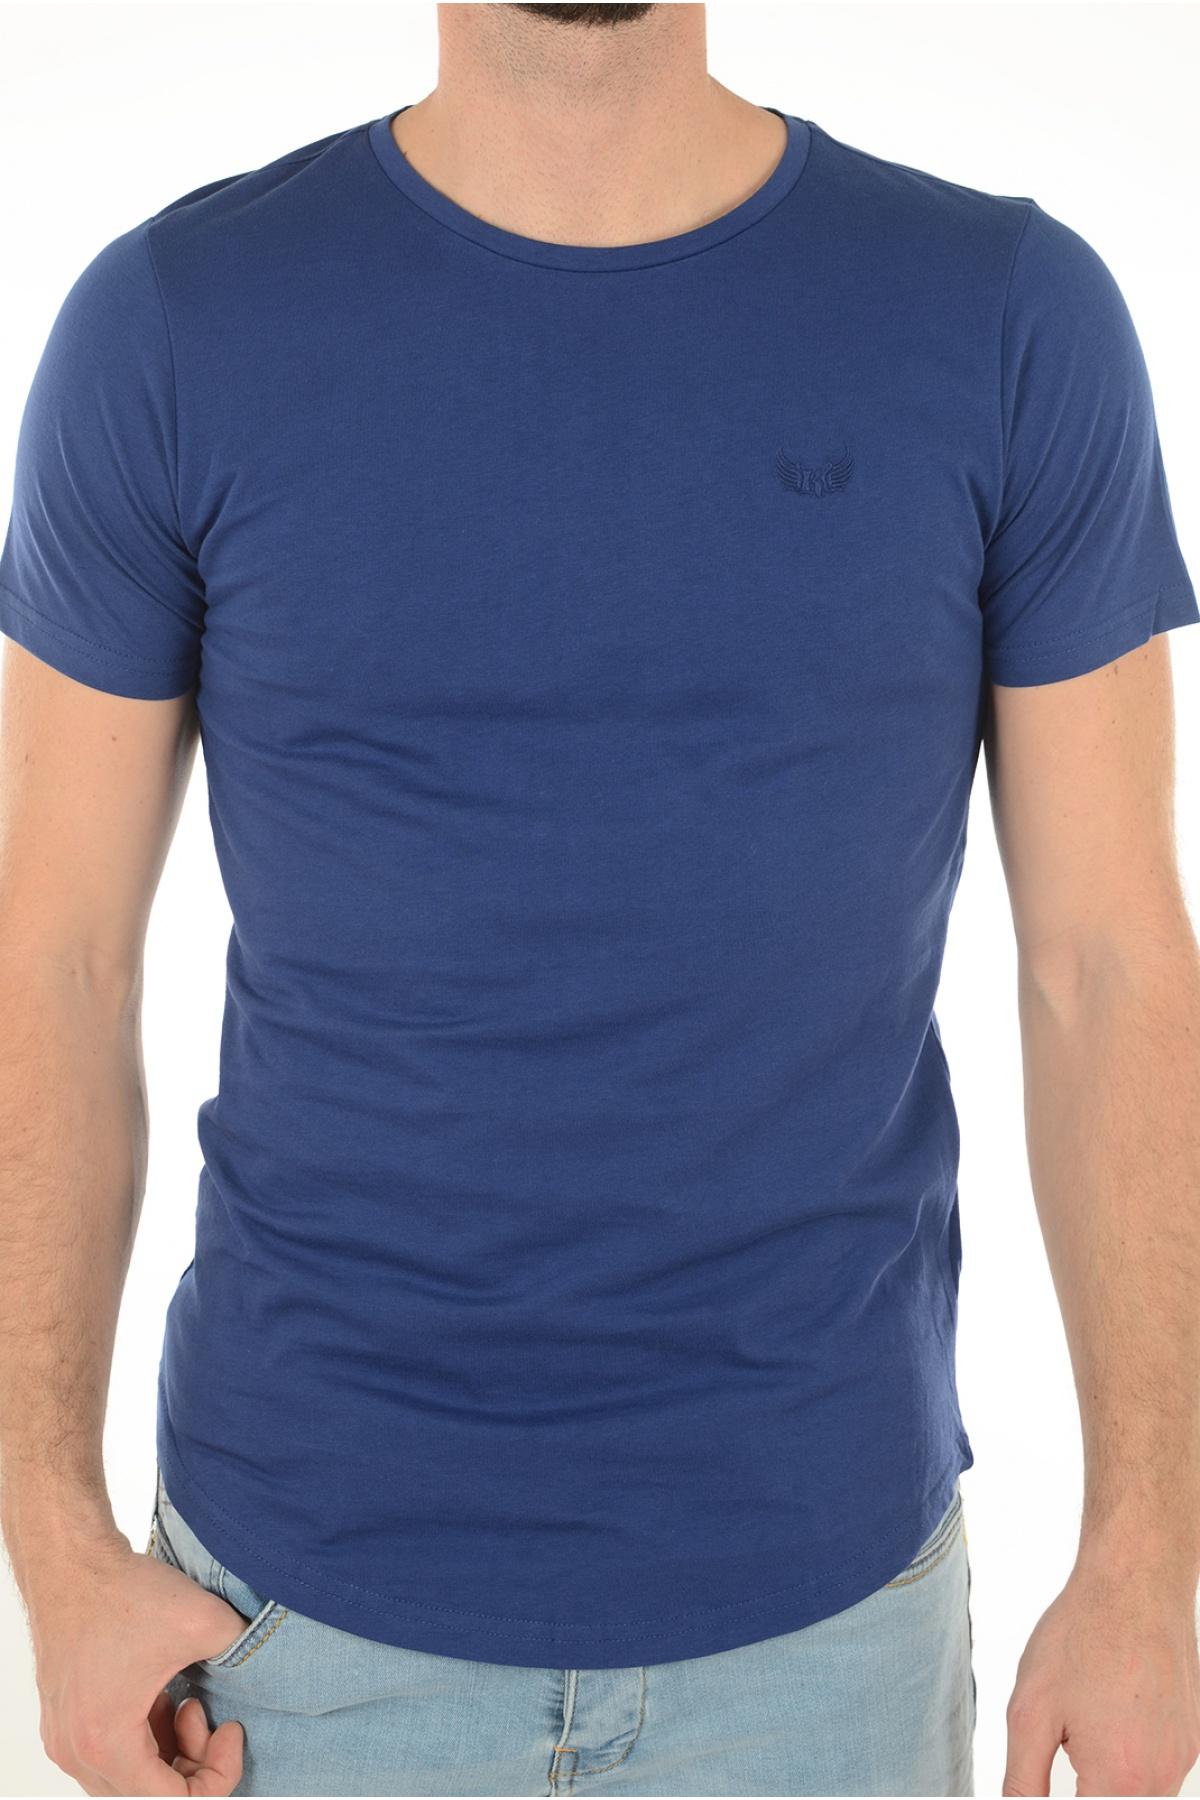 Tee-shirts Kaporal Homme Xxl